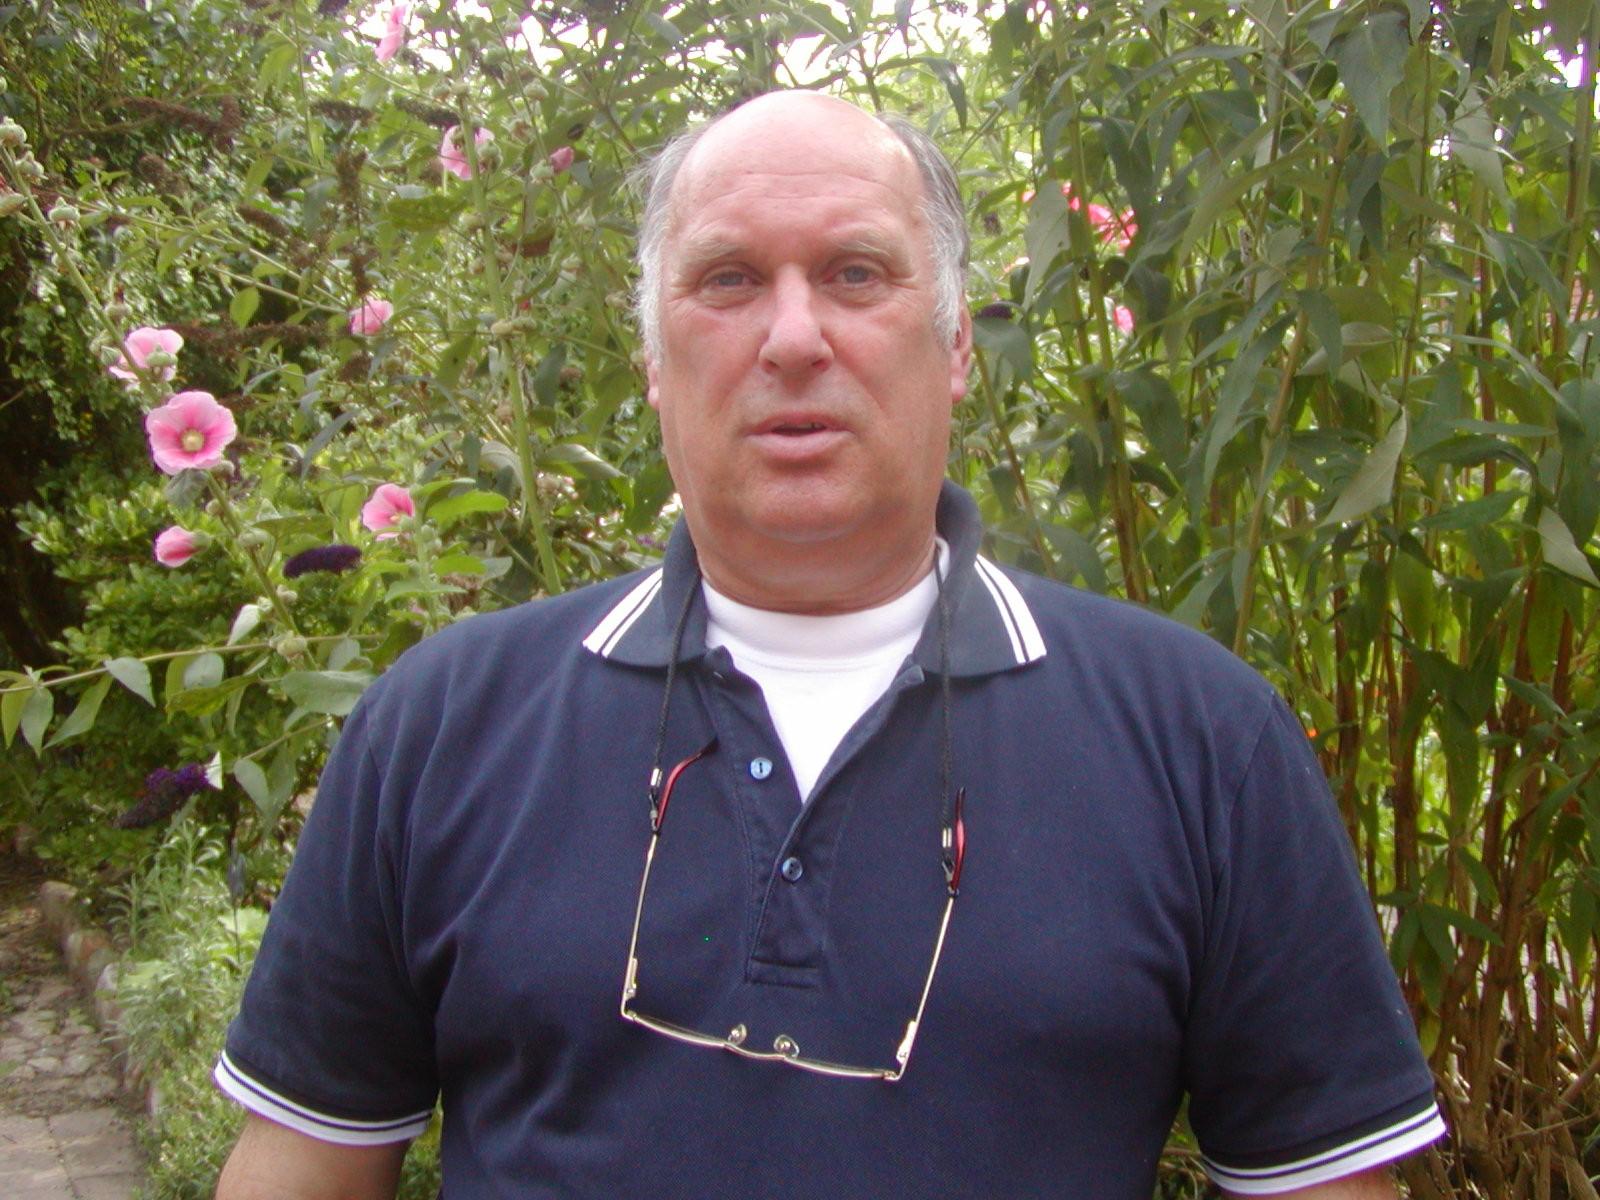 Peter Pastuch